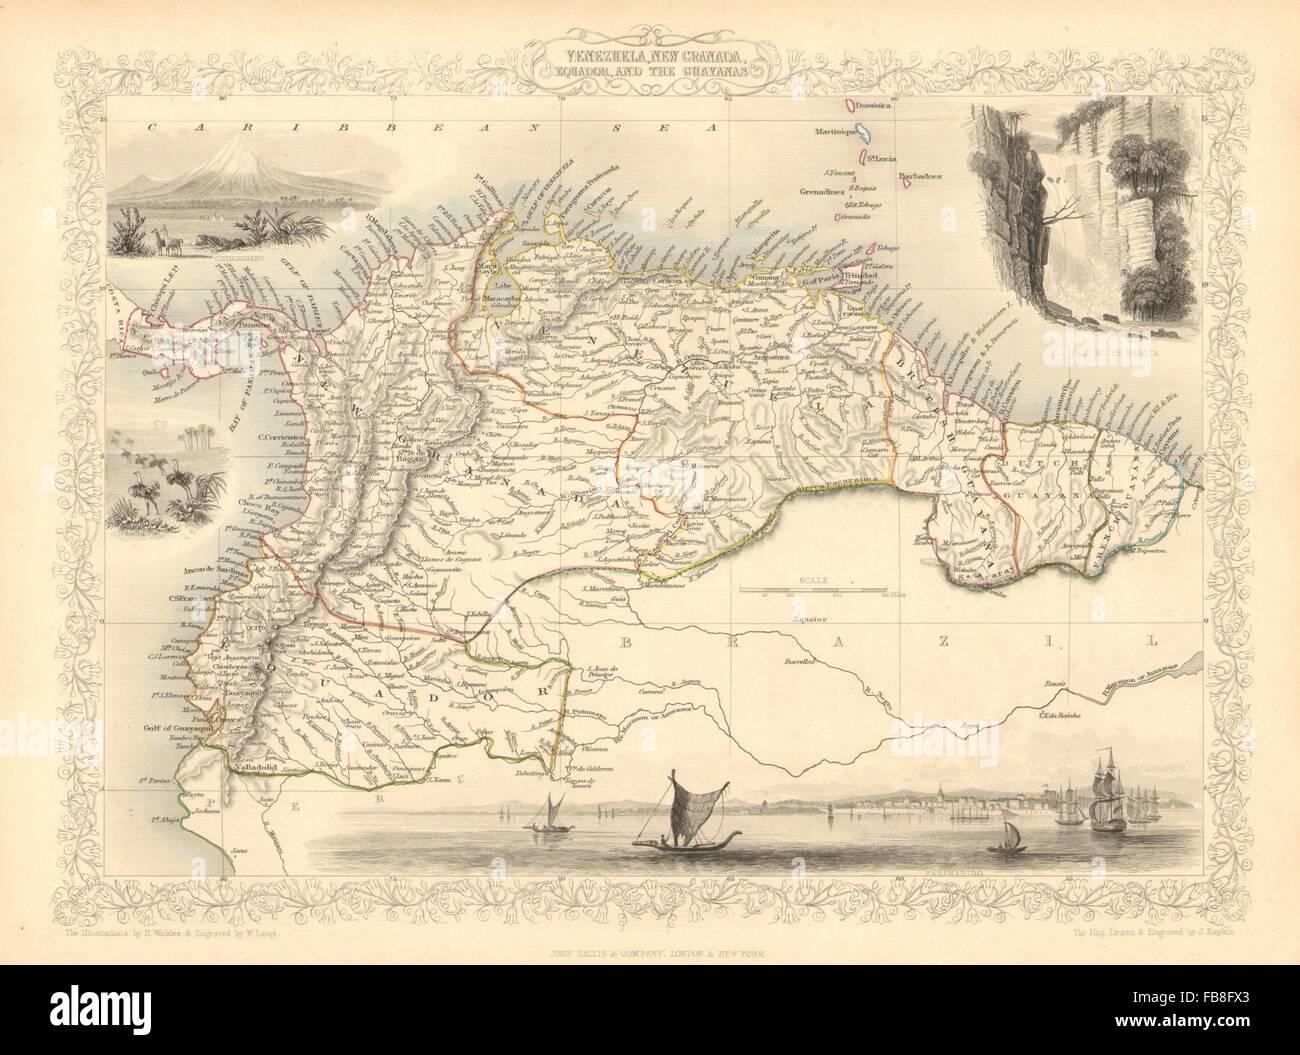 VENEZUELA, NEW GRANADA, EQUADOR & THE GUYANAS': Ecuador.TALLIS/RAPKIN, 1851 map Stock Photo